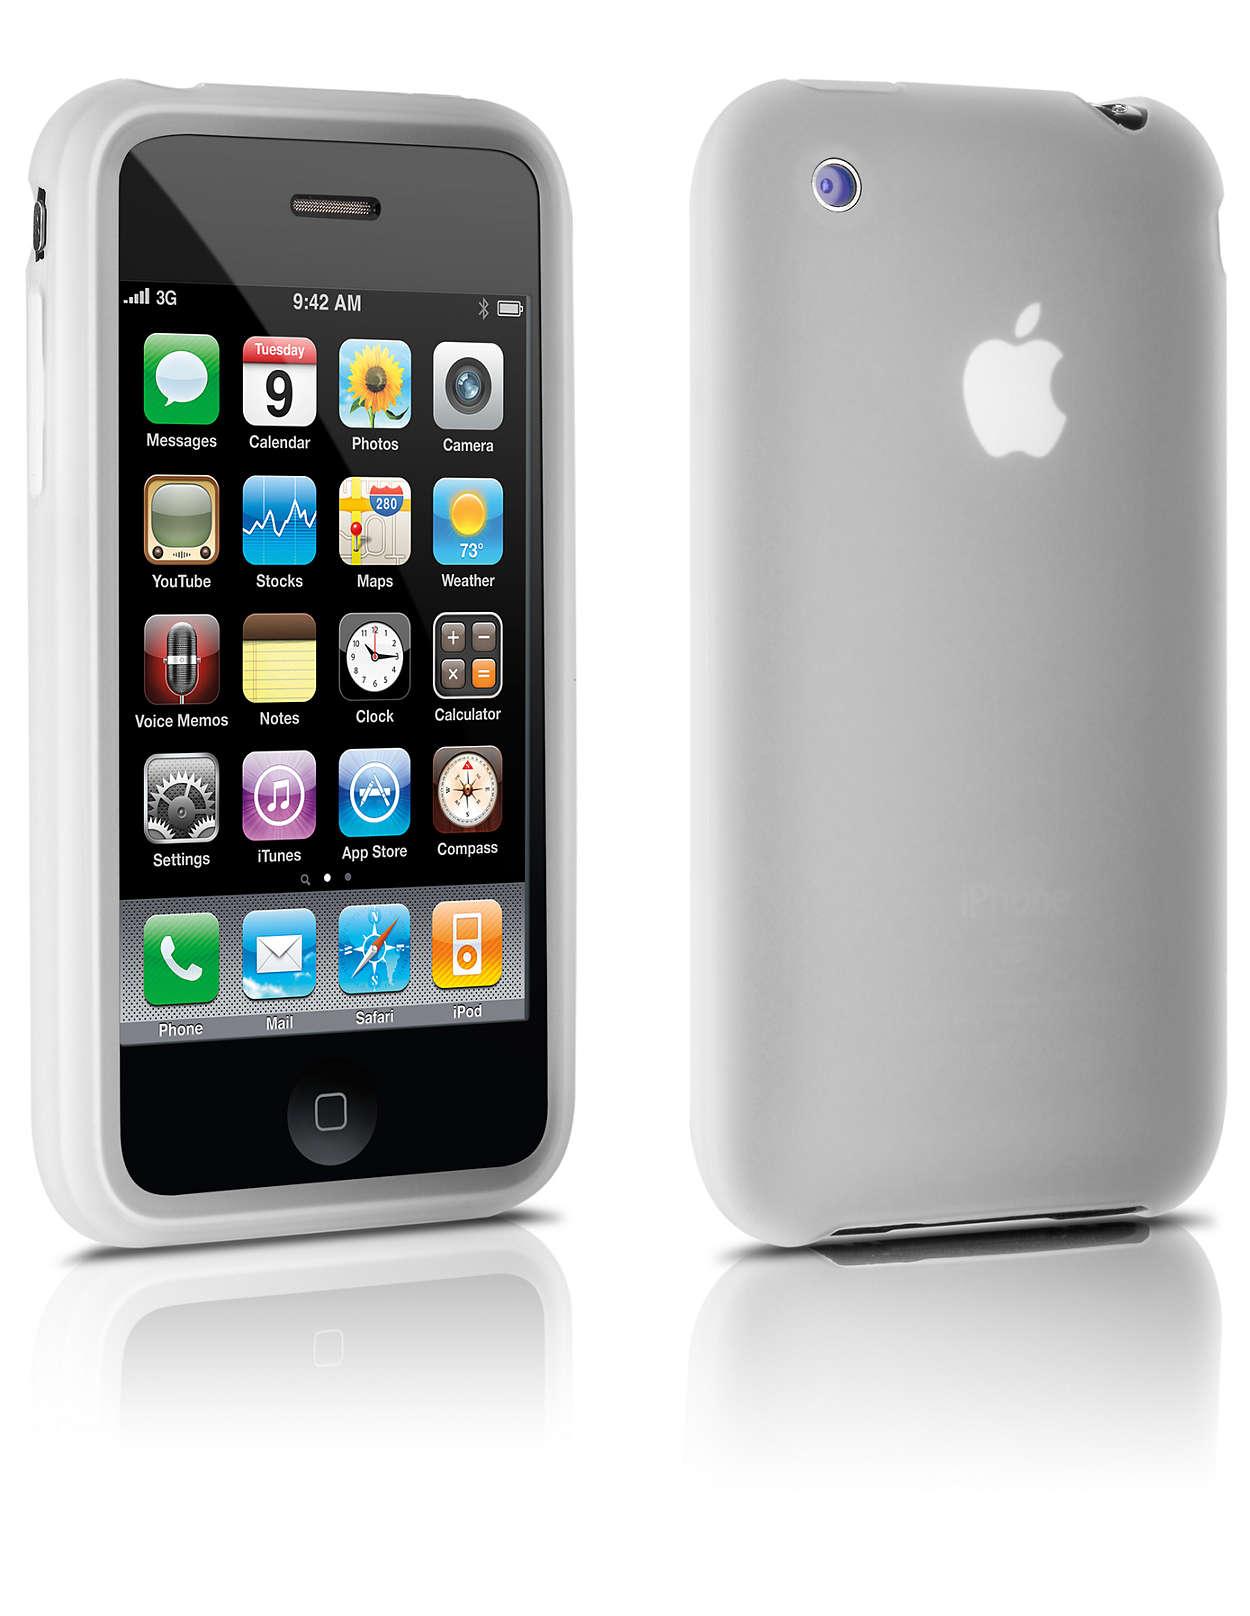 Skydda din iPhone i silikonfodral